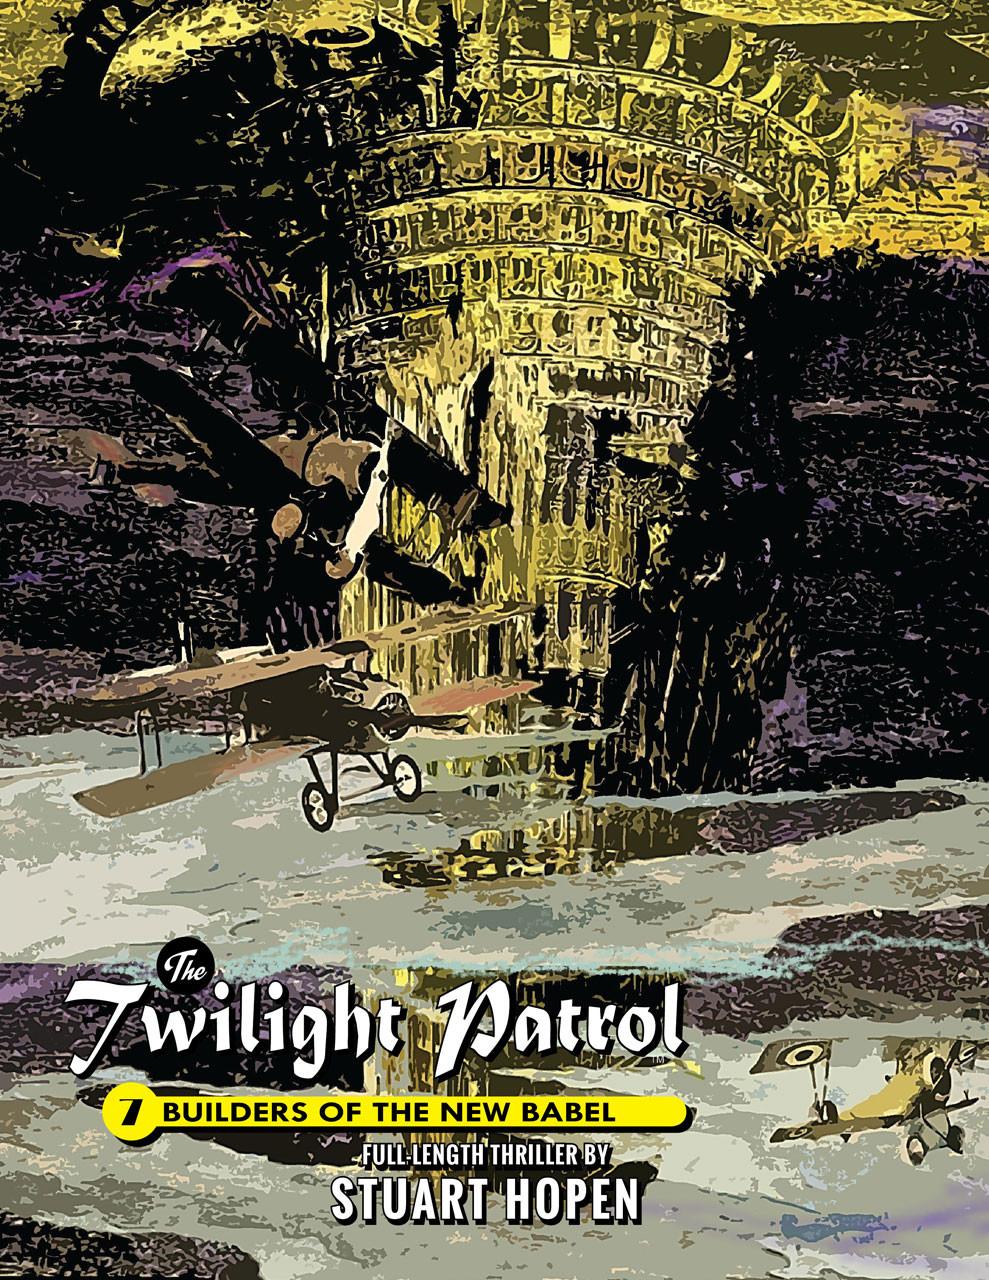 Twilight Patrol #7: Builders of the New Babel